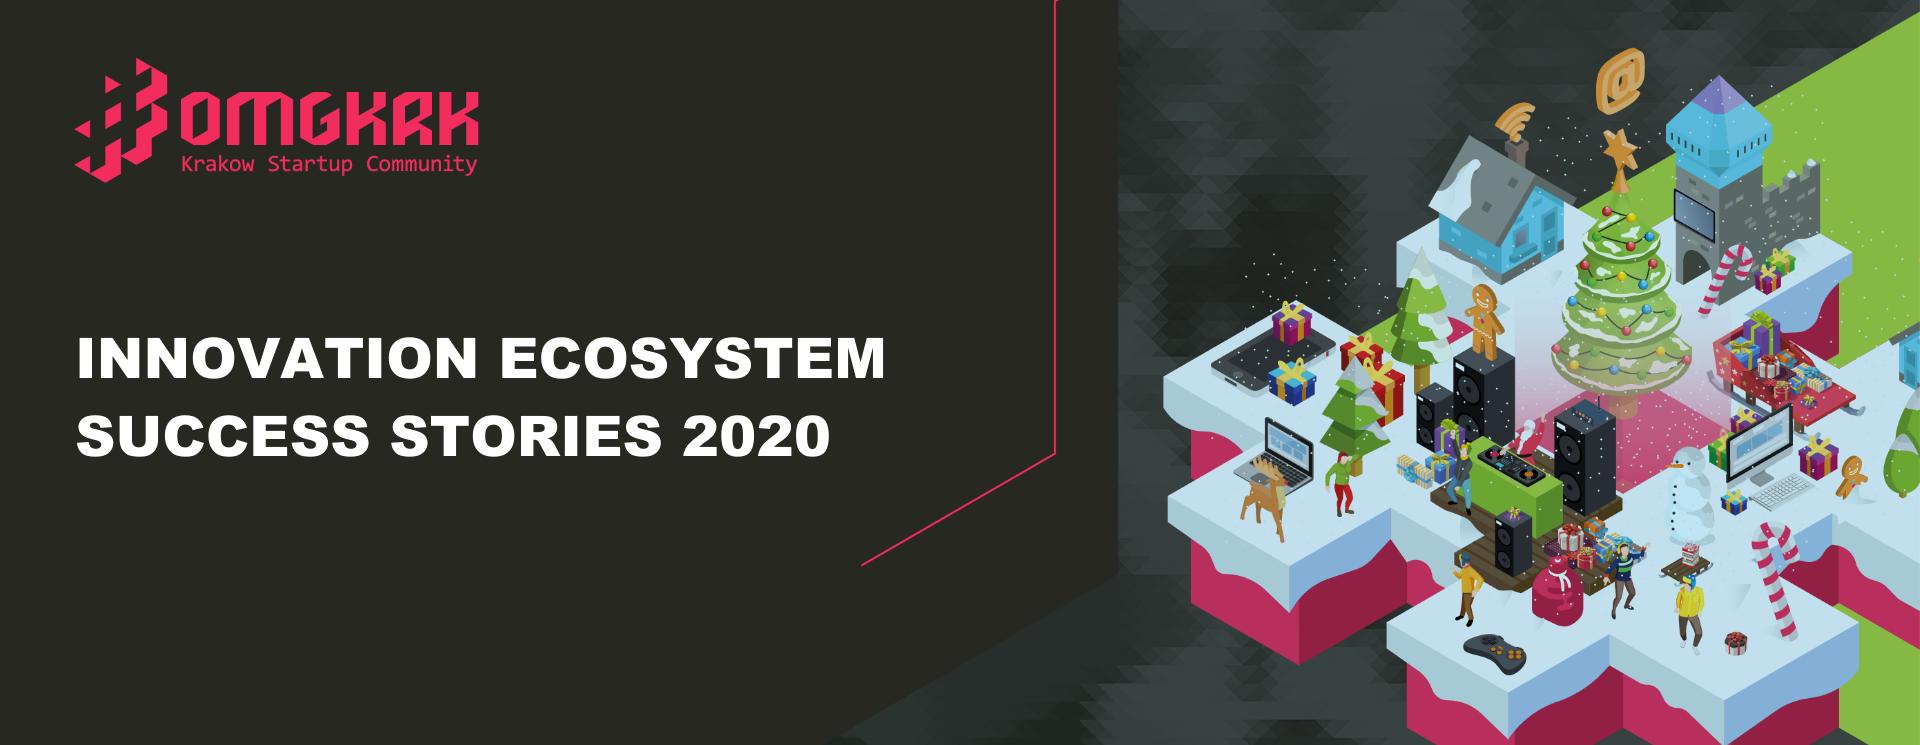 , Innovation Ecosystem Success Stories 2020